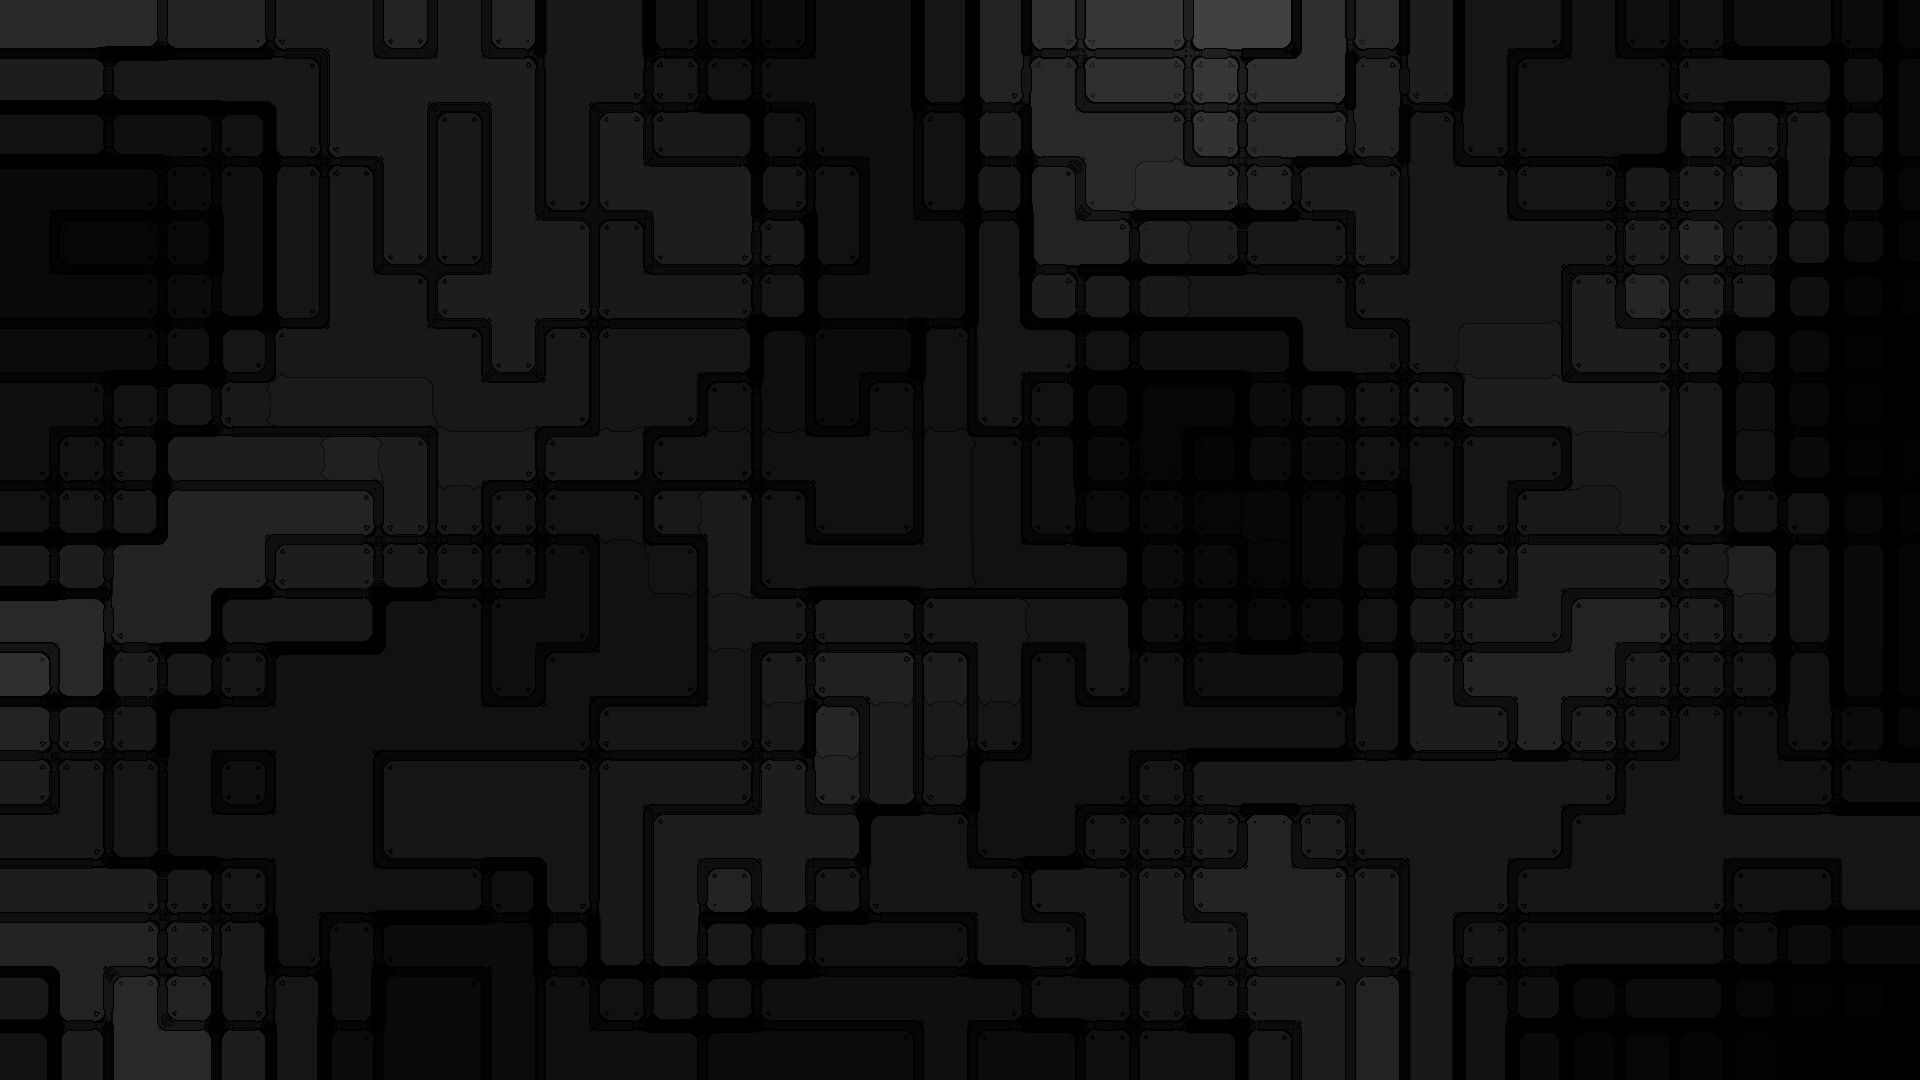 23 Black Pattern Backgrounds Hq Alanna Gorch